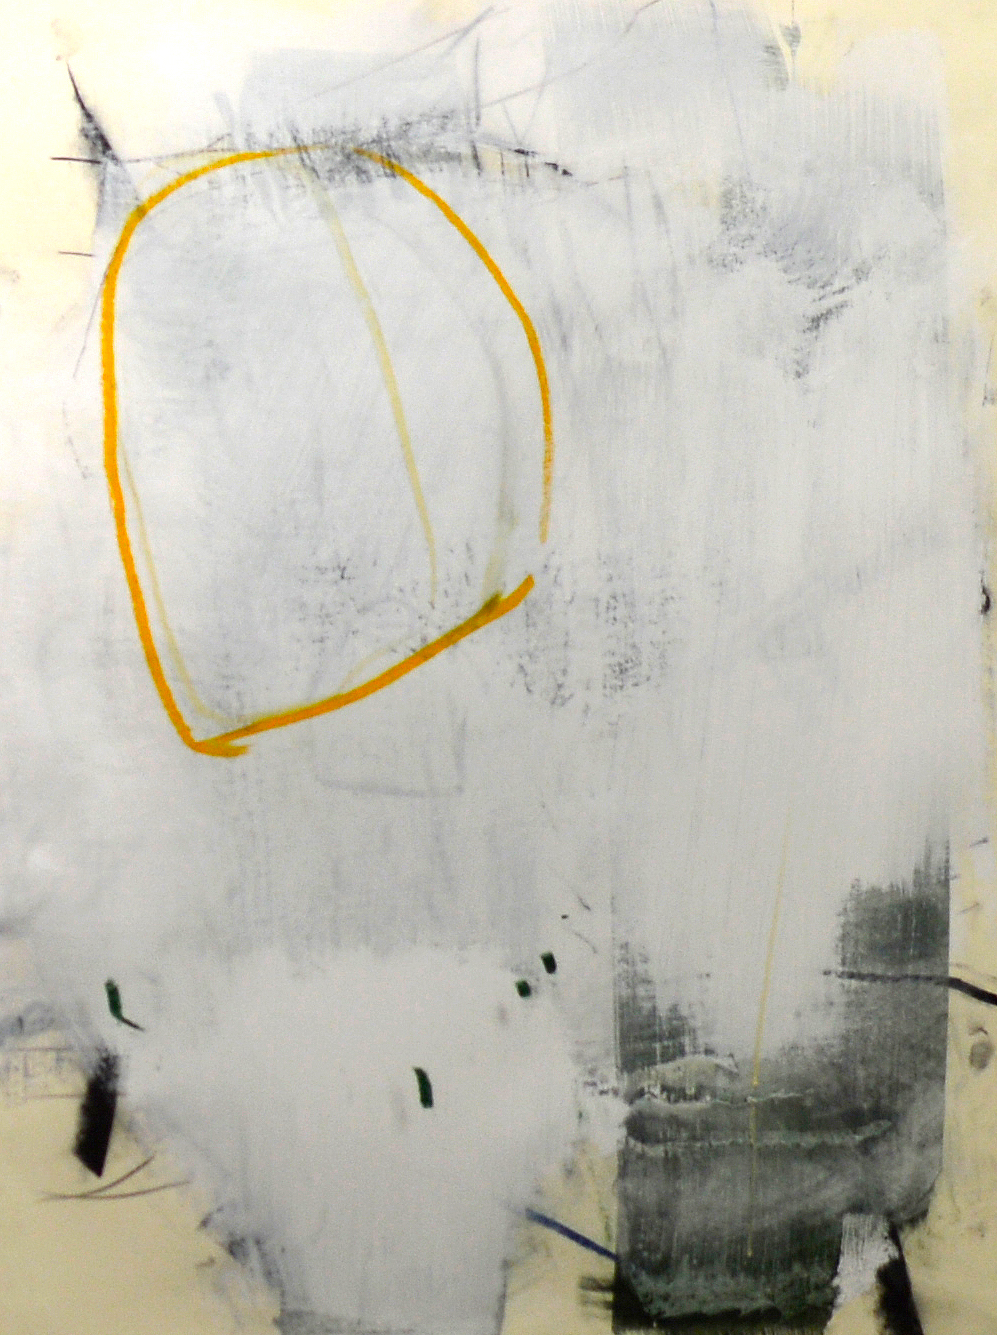 Artist: Sam Lock  Title: Work on Paper  Size: 80 x 65 cm  Medium: Oil on paper  Price: £3000